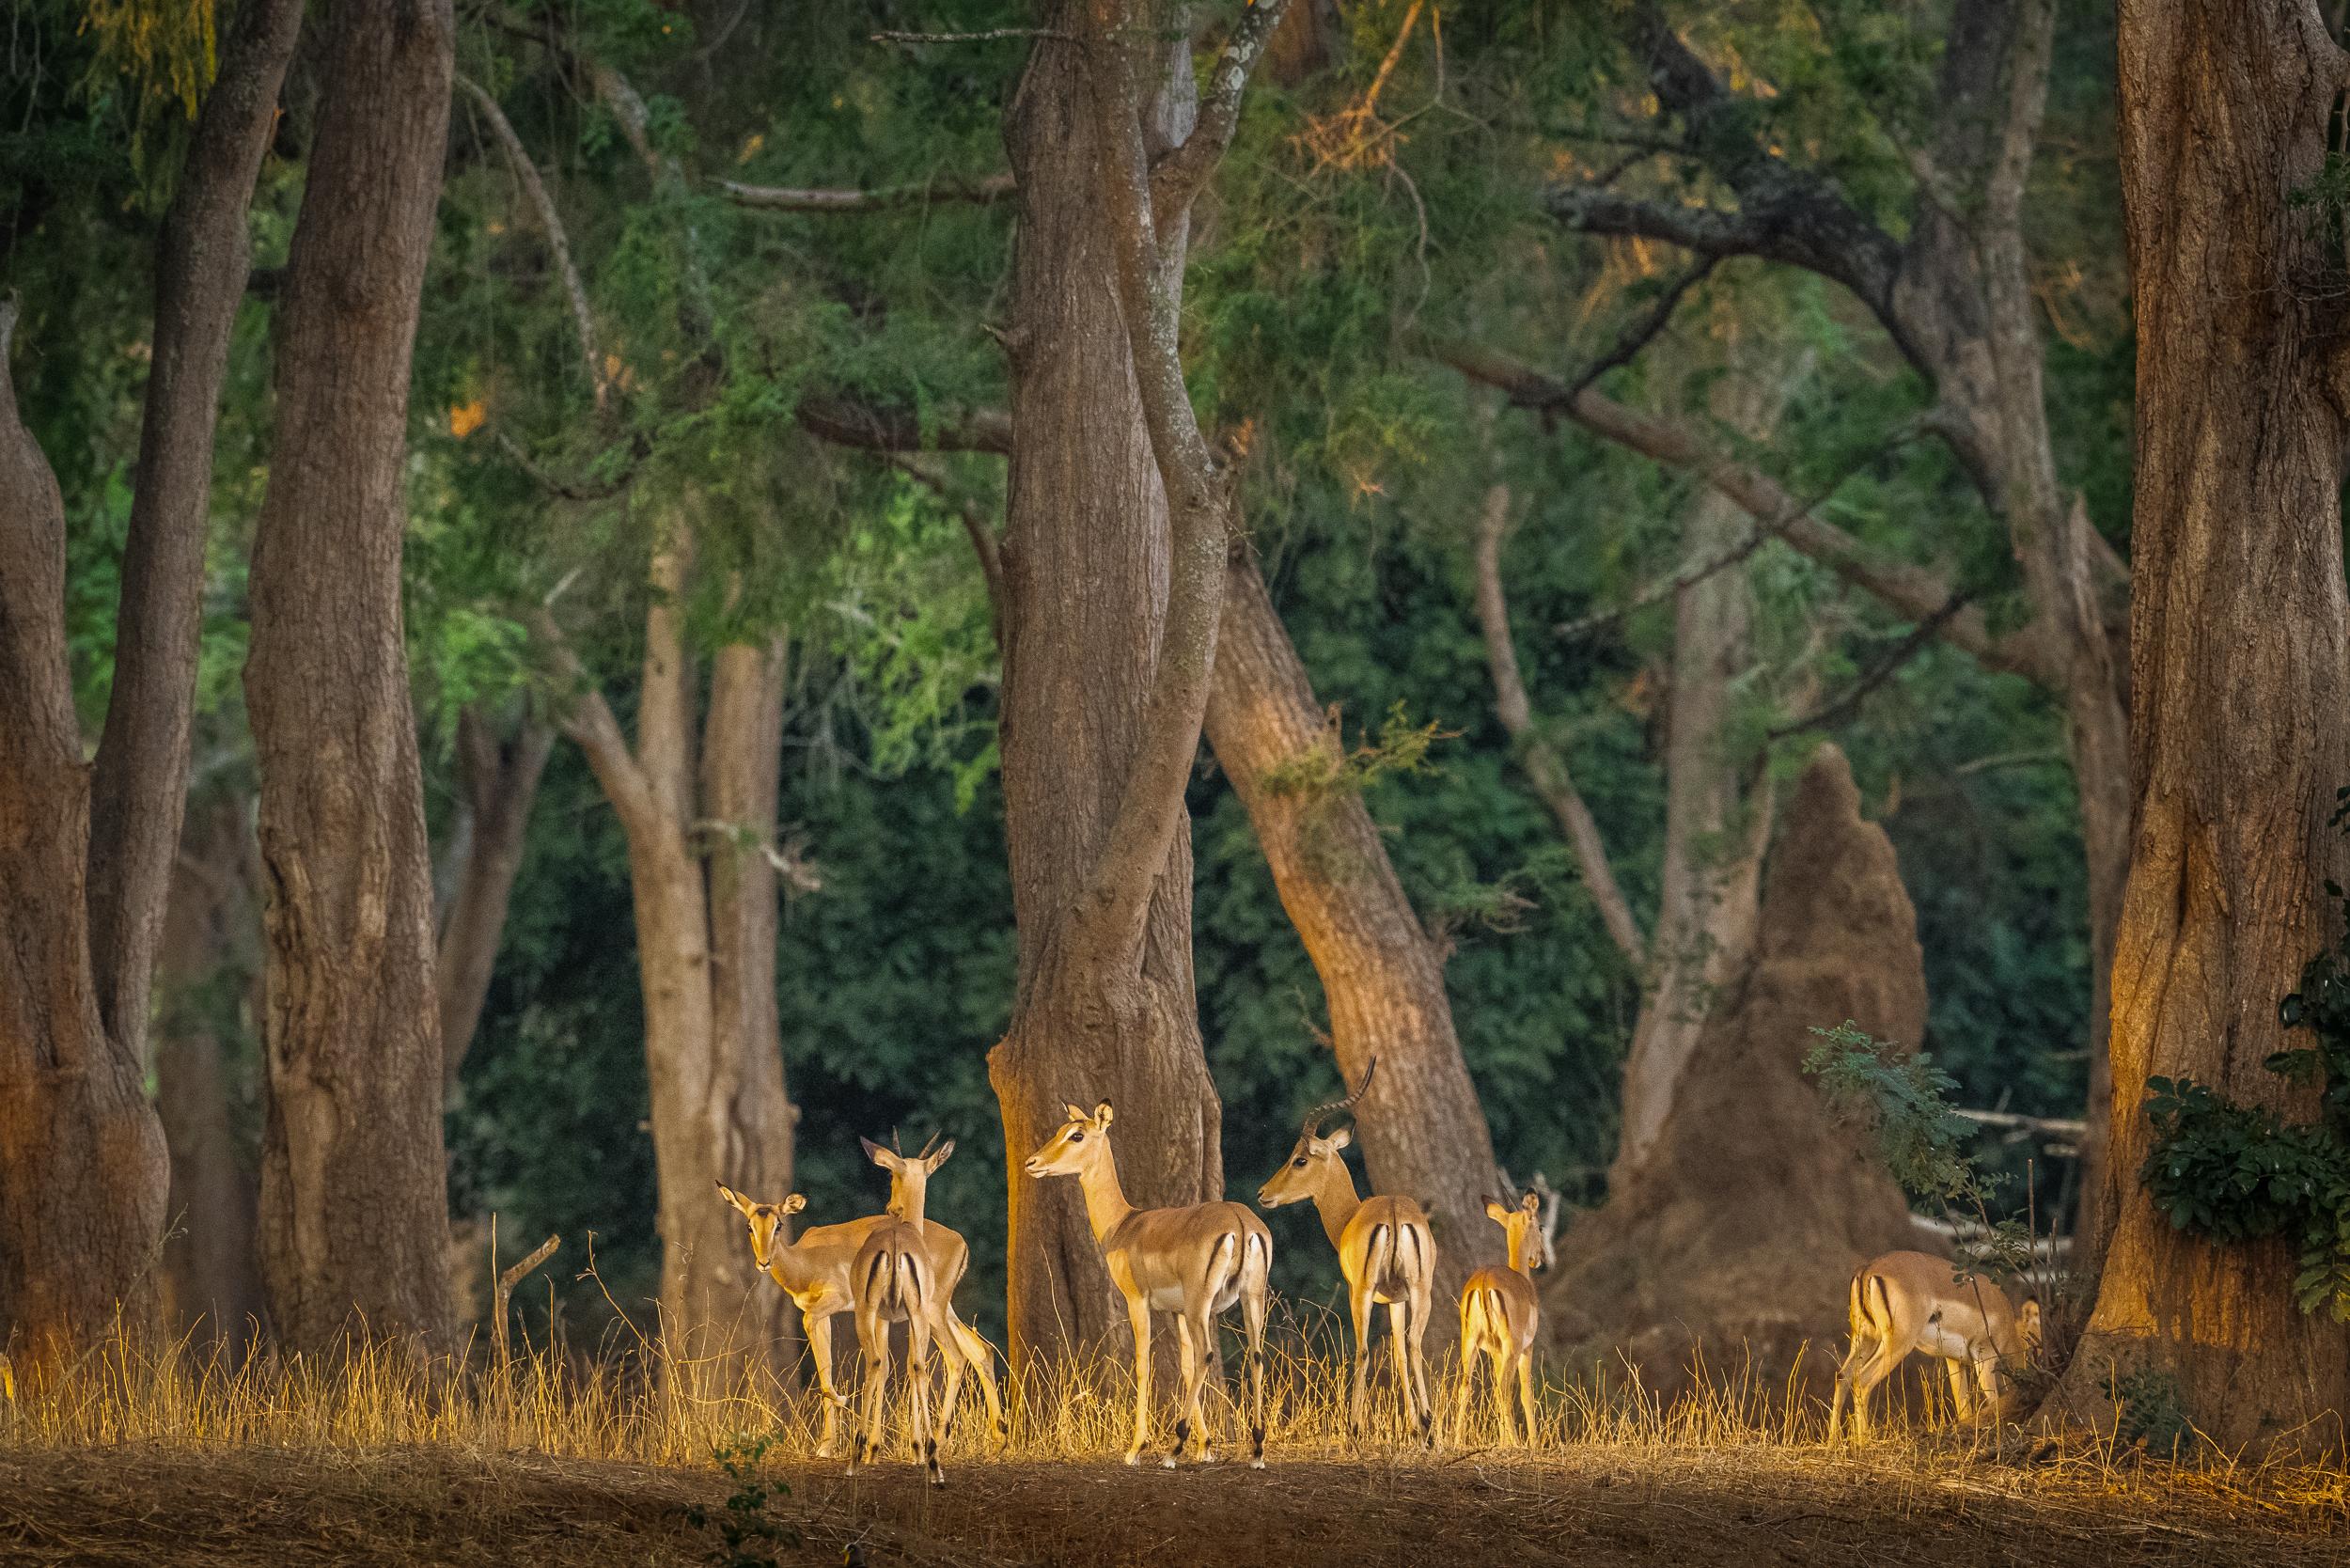 Zambia-5465.jpg